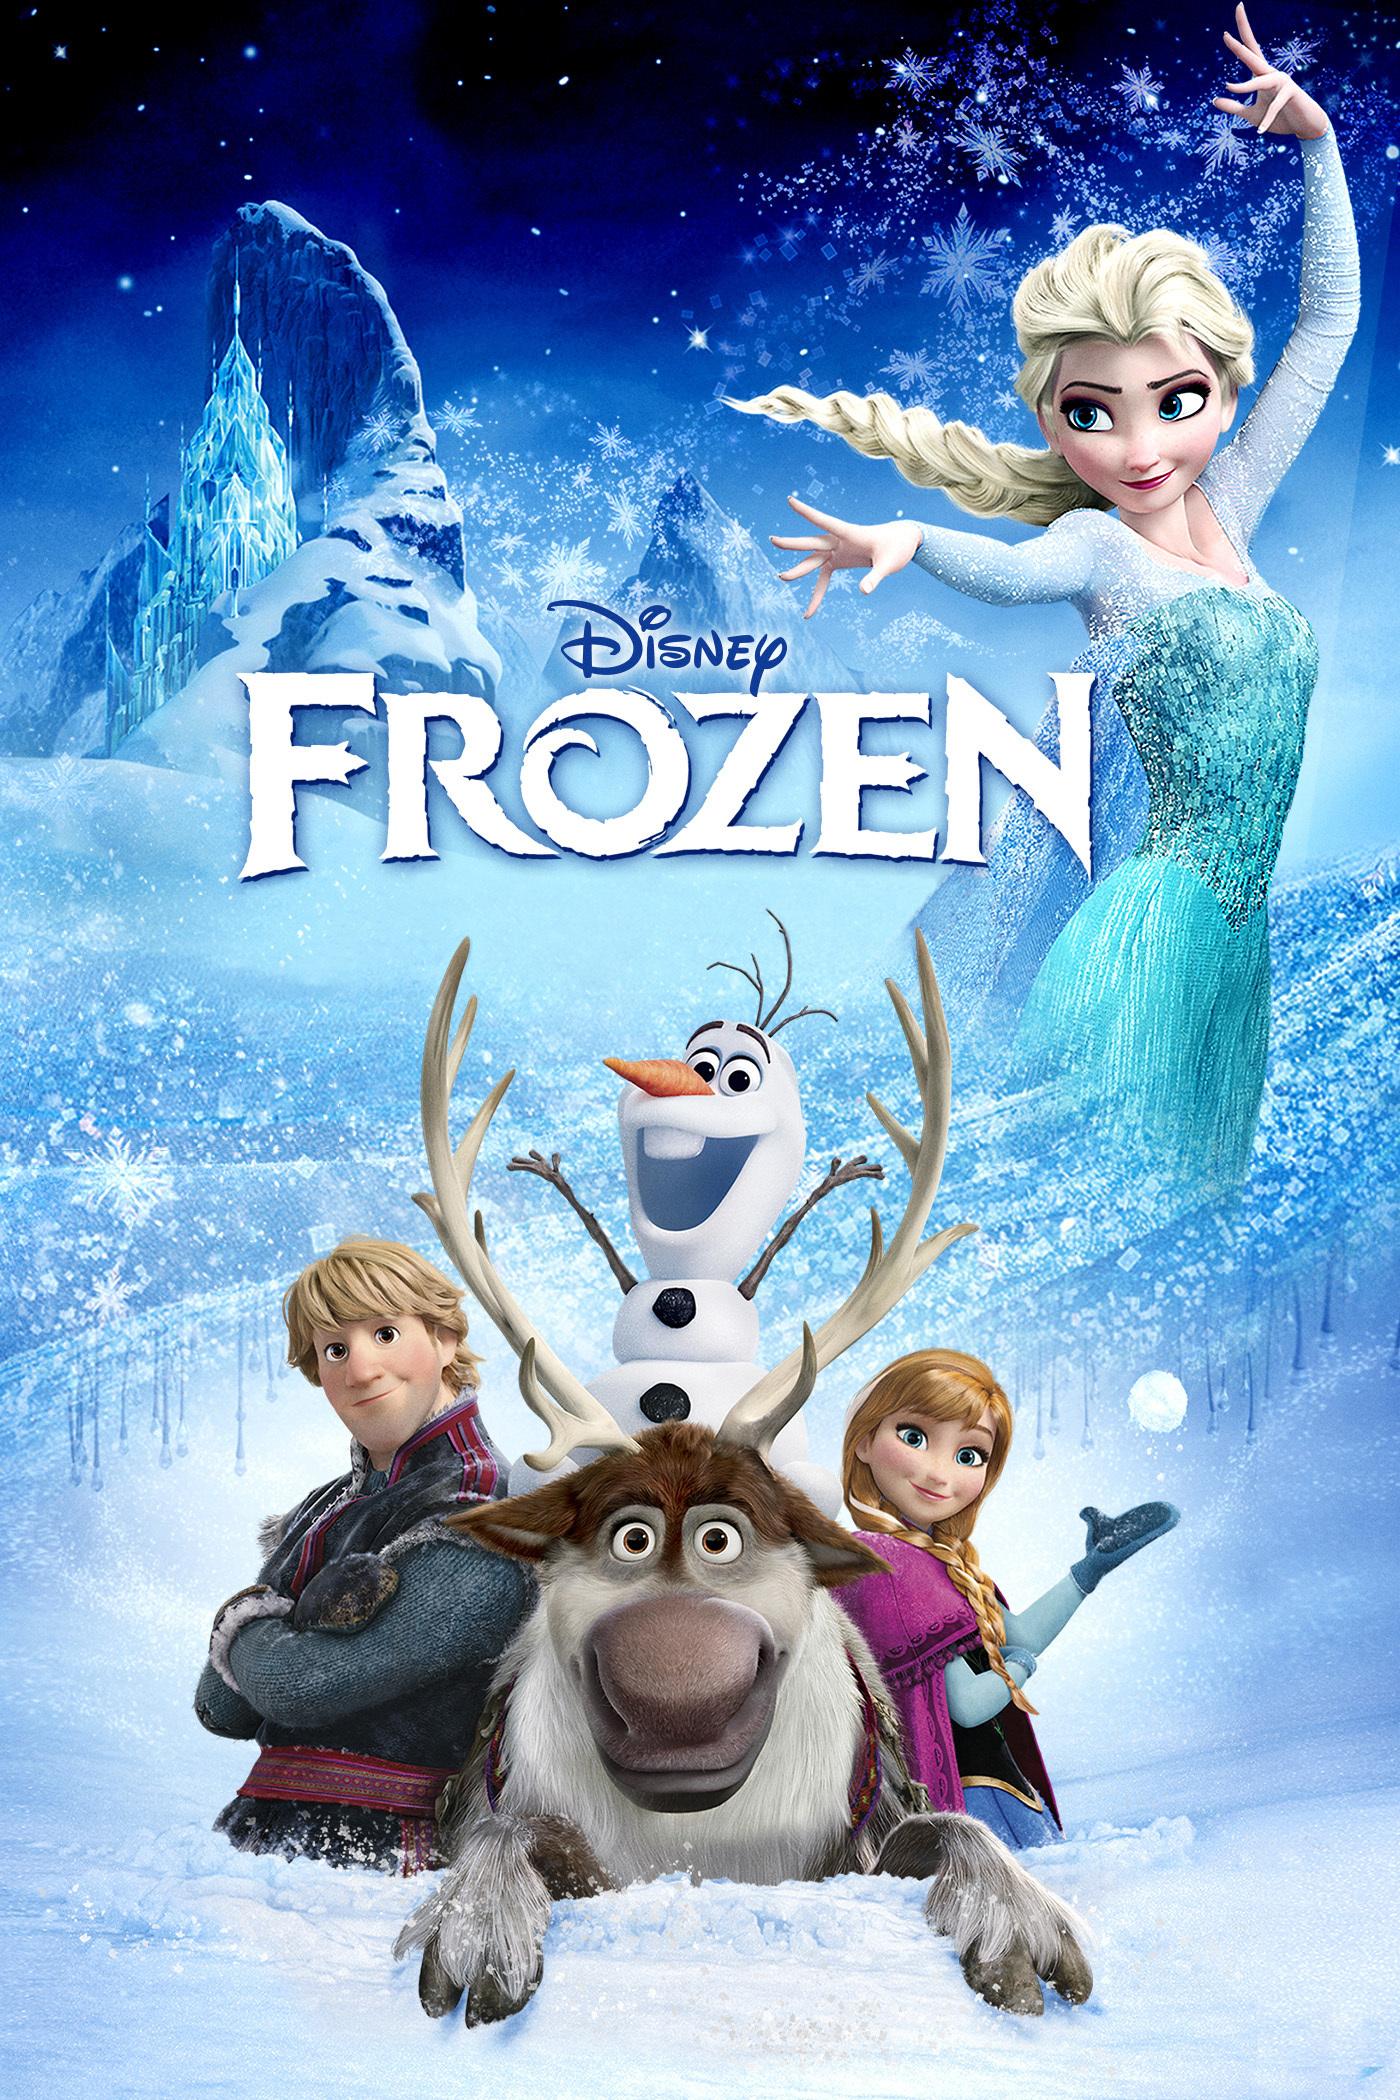 Image - Frozen - Poster.jpg | Disney Wiki | FANDOM powered ...